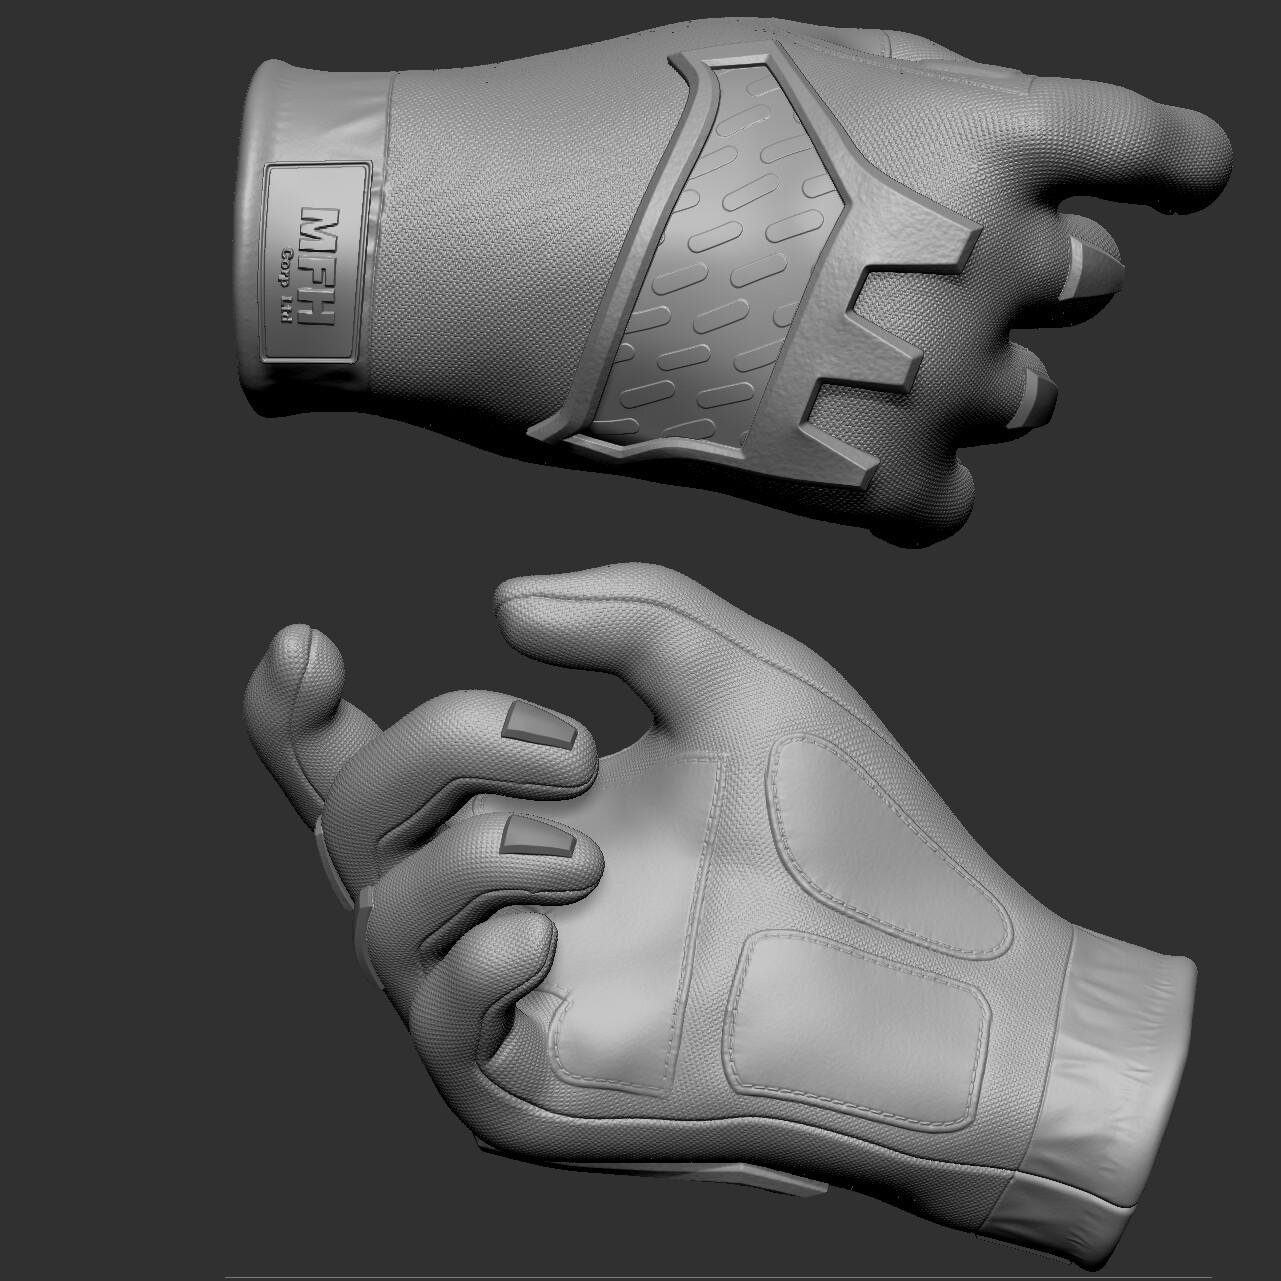 Glove progress [WIP]